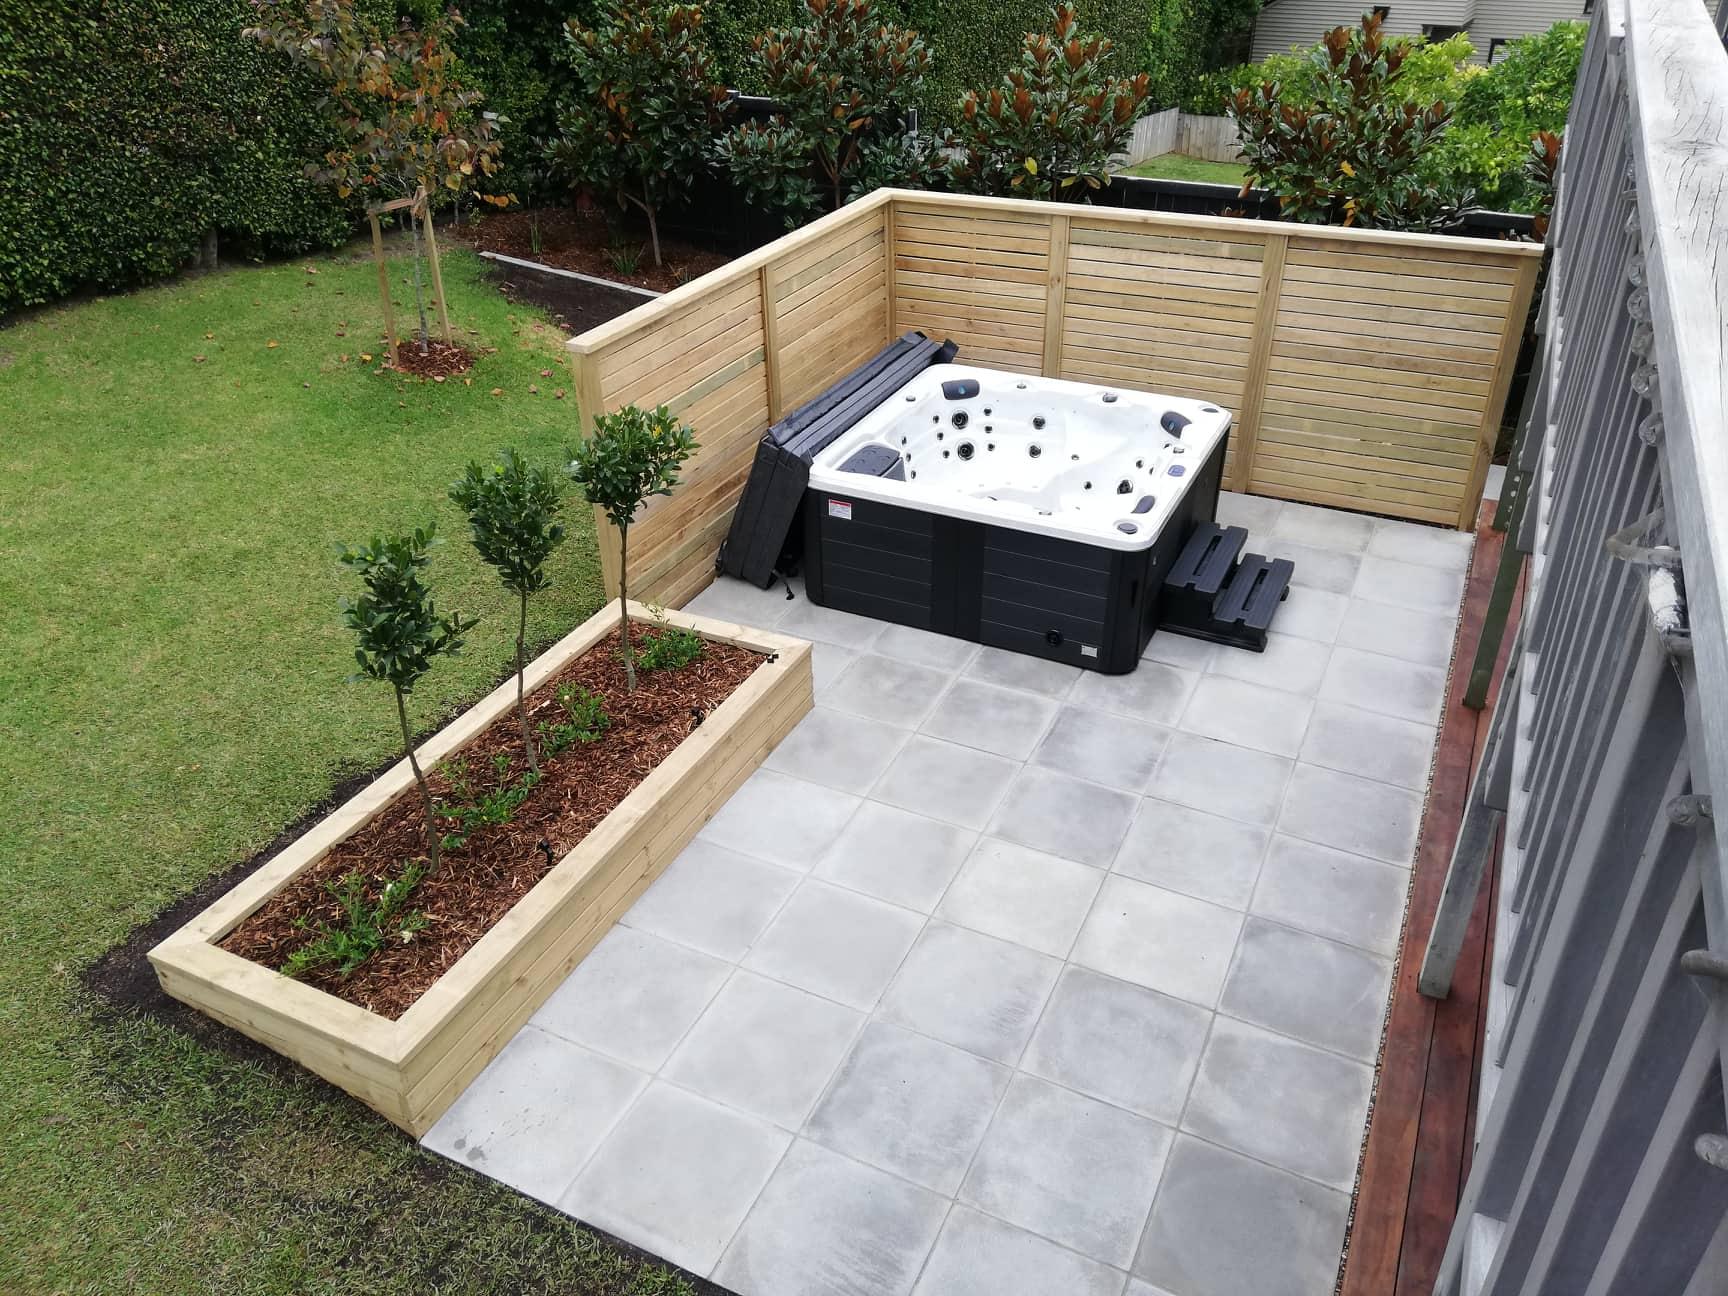 Designer gardens paving